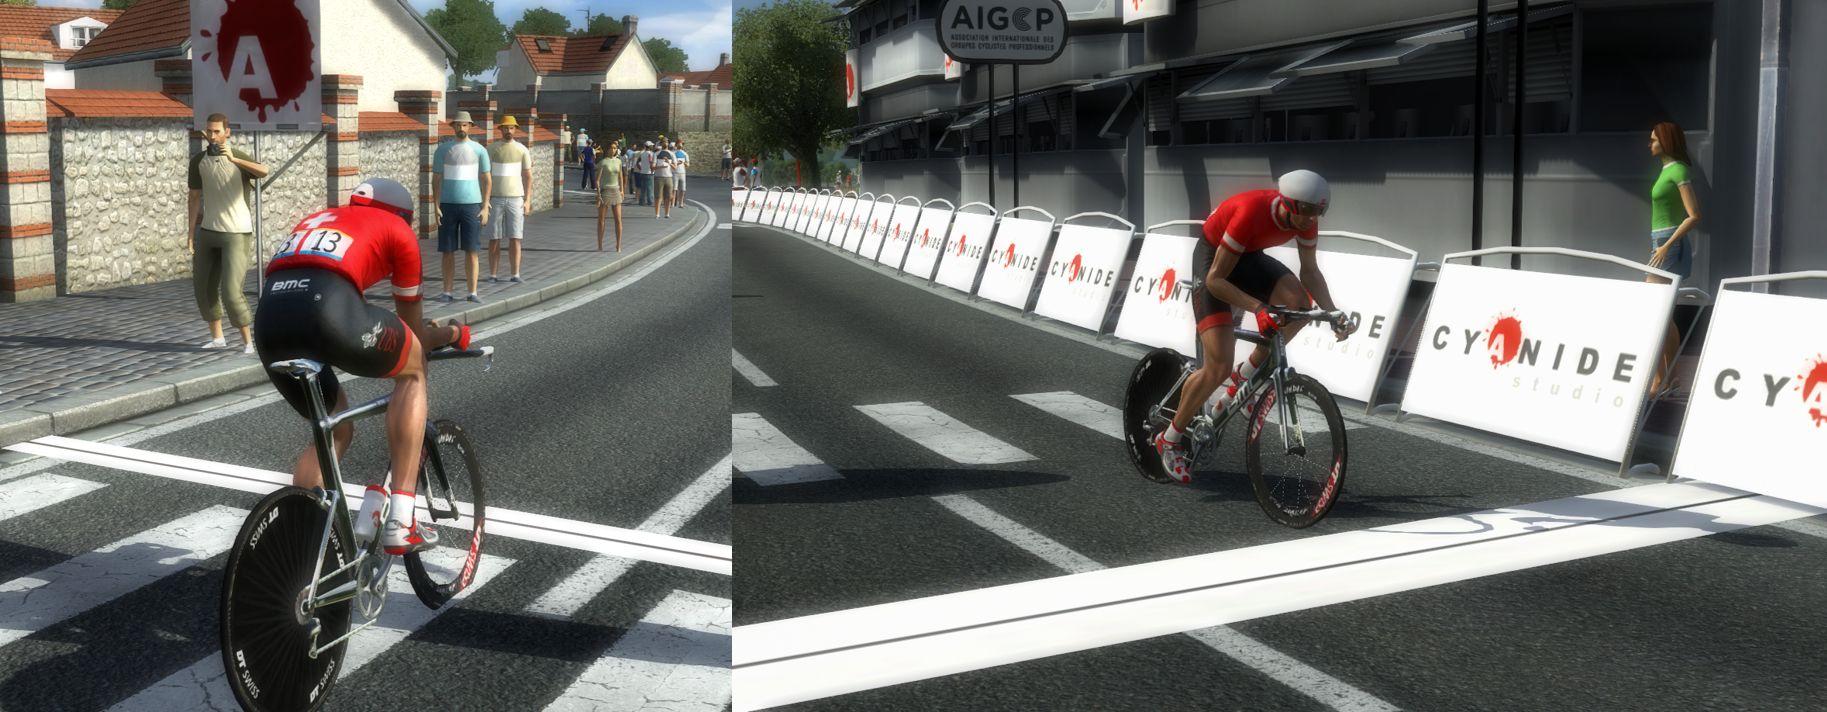 pcmdaily.com/images/mg/2019/Races/C1/Bayern/S4/mg19_bay_s04_03.jpg